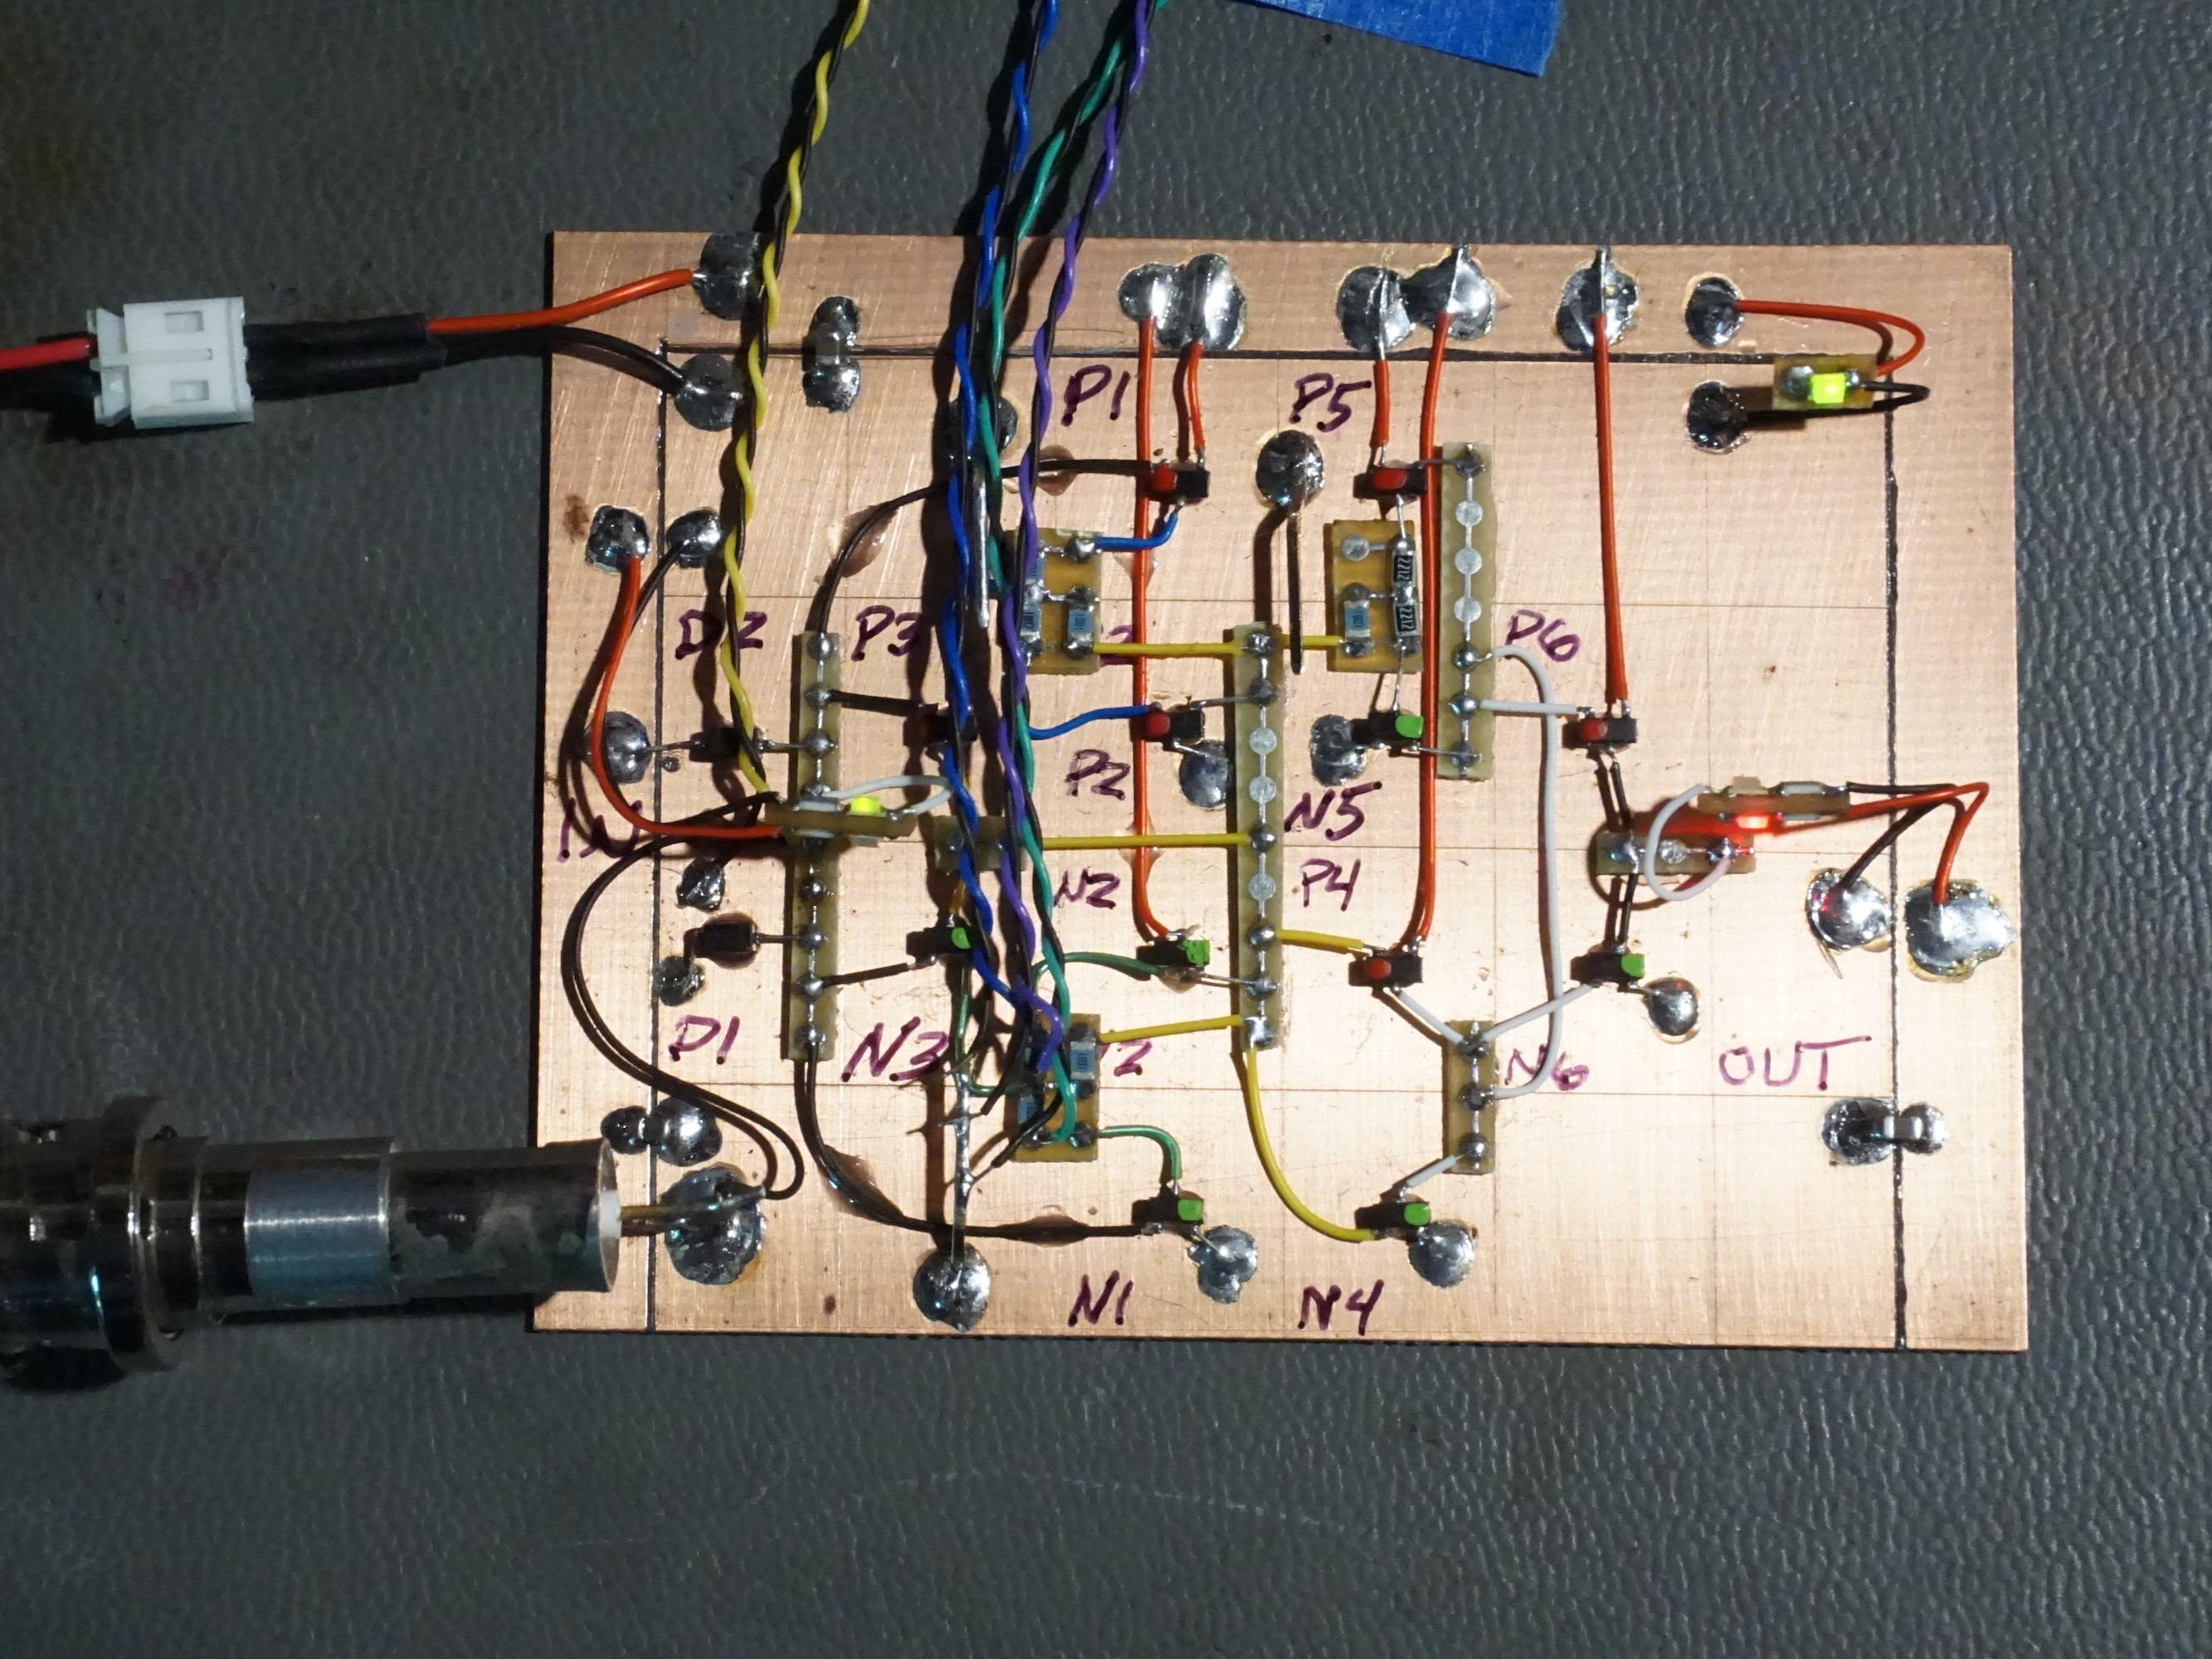 components_cmos-schmitt-n1n2.jpg